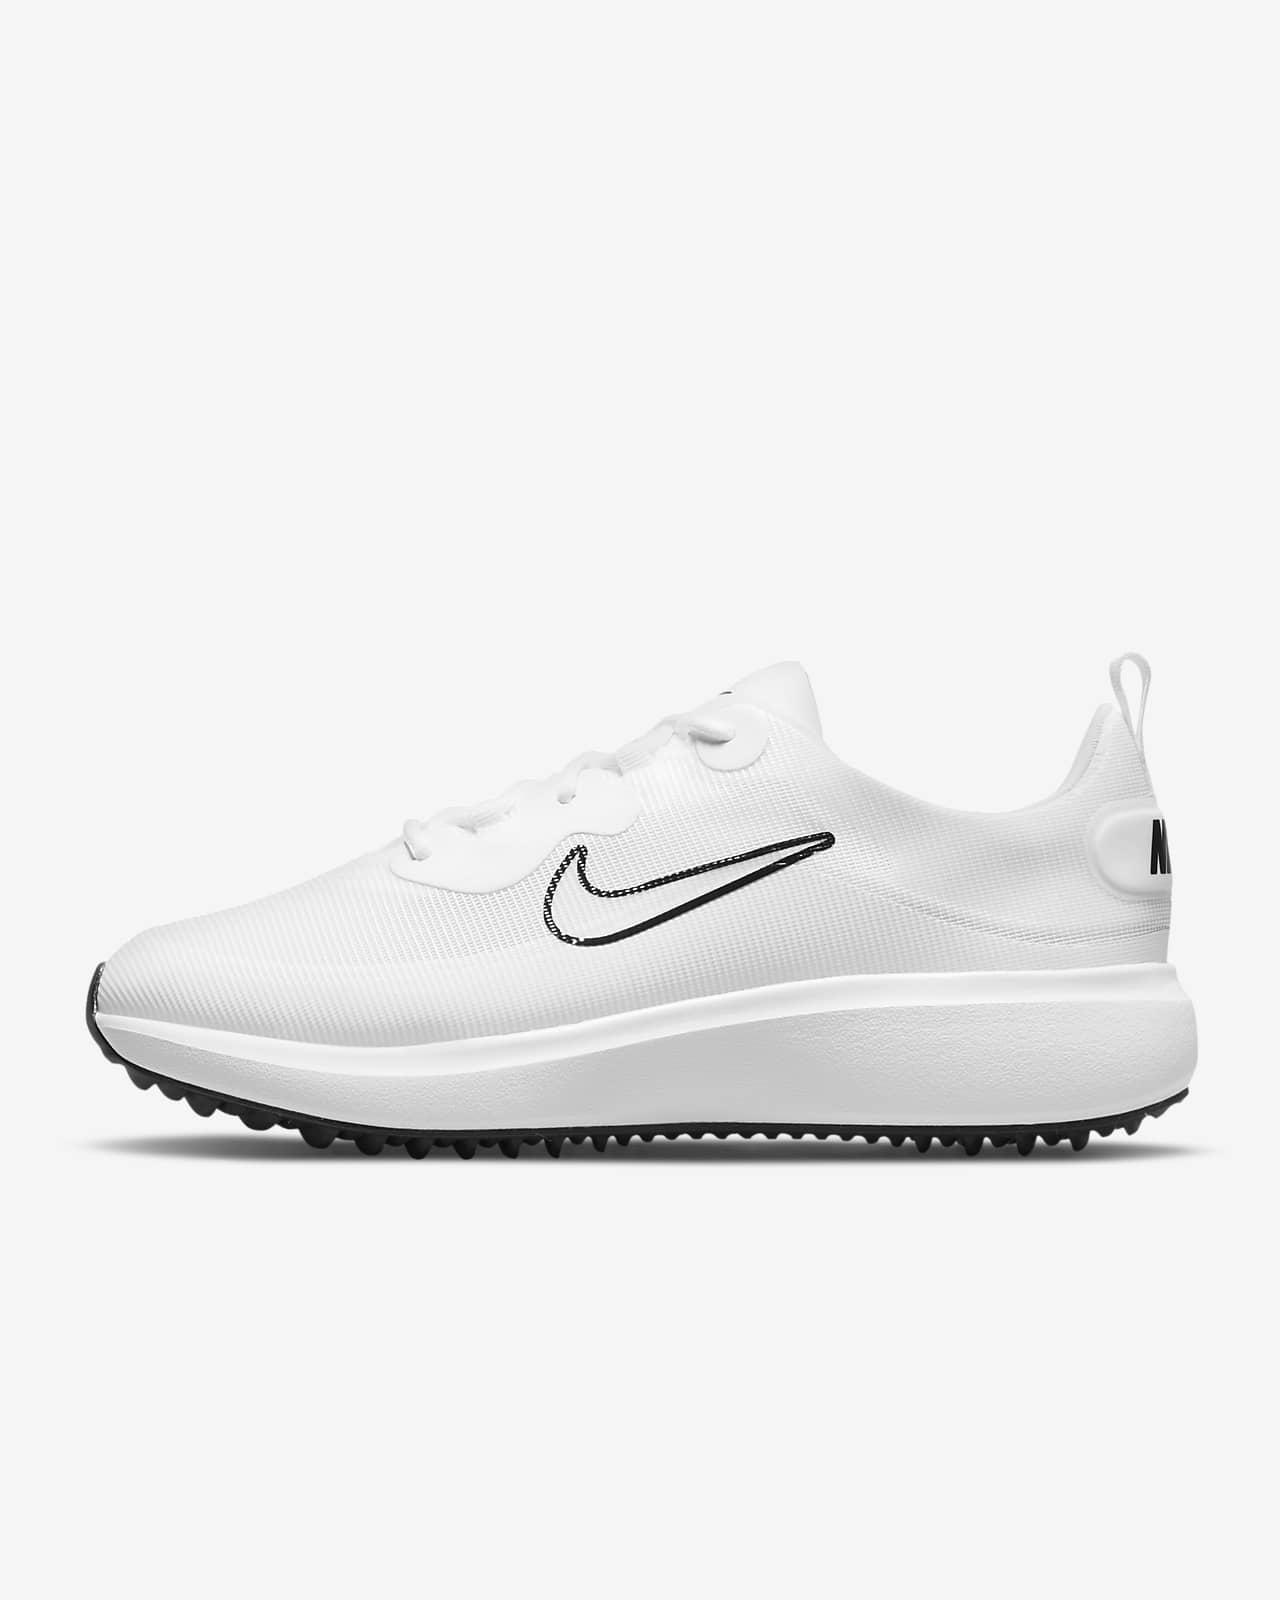 Calzado de golf para mujer (ancho) Nike Ace Summerlite